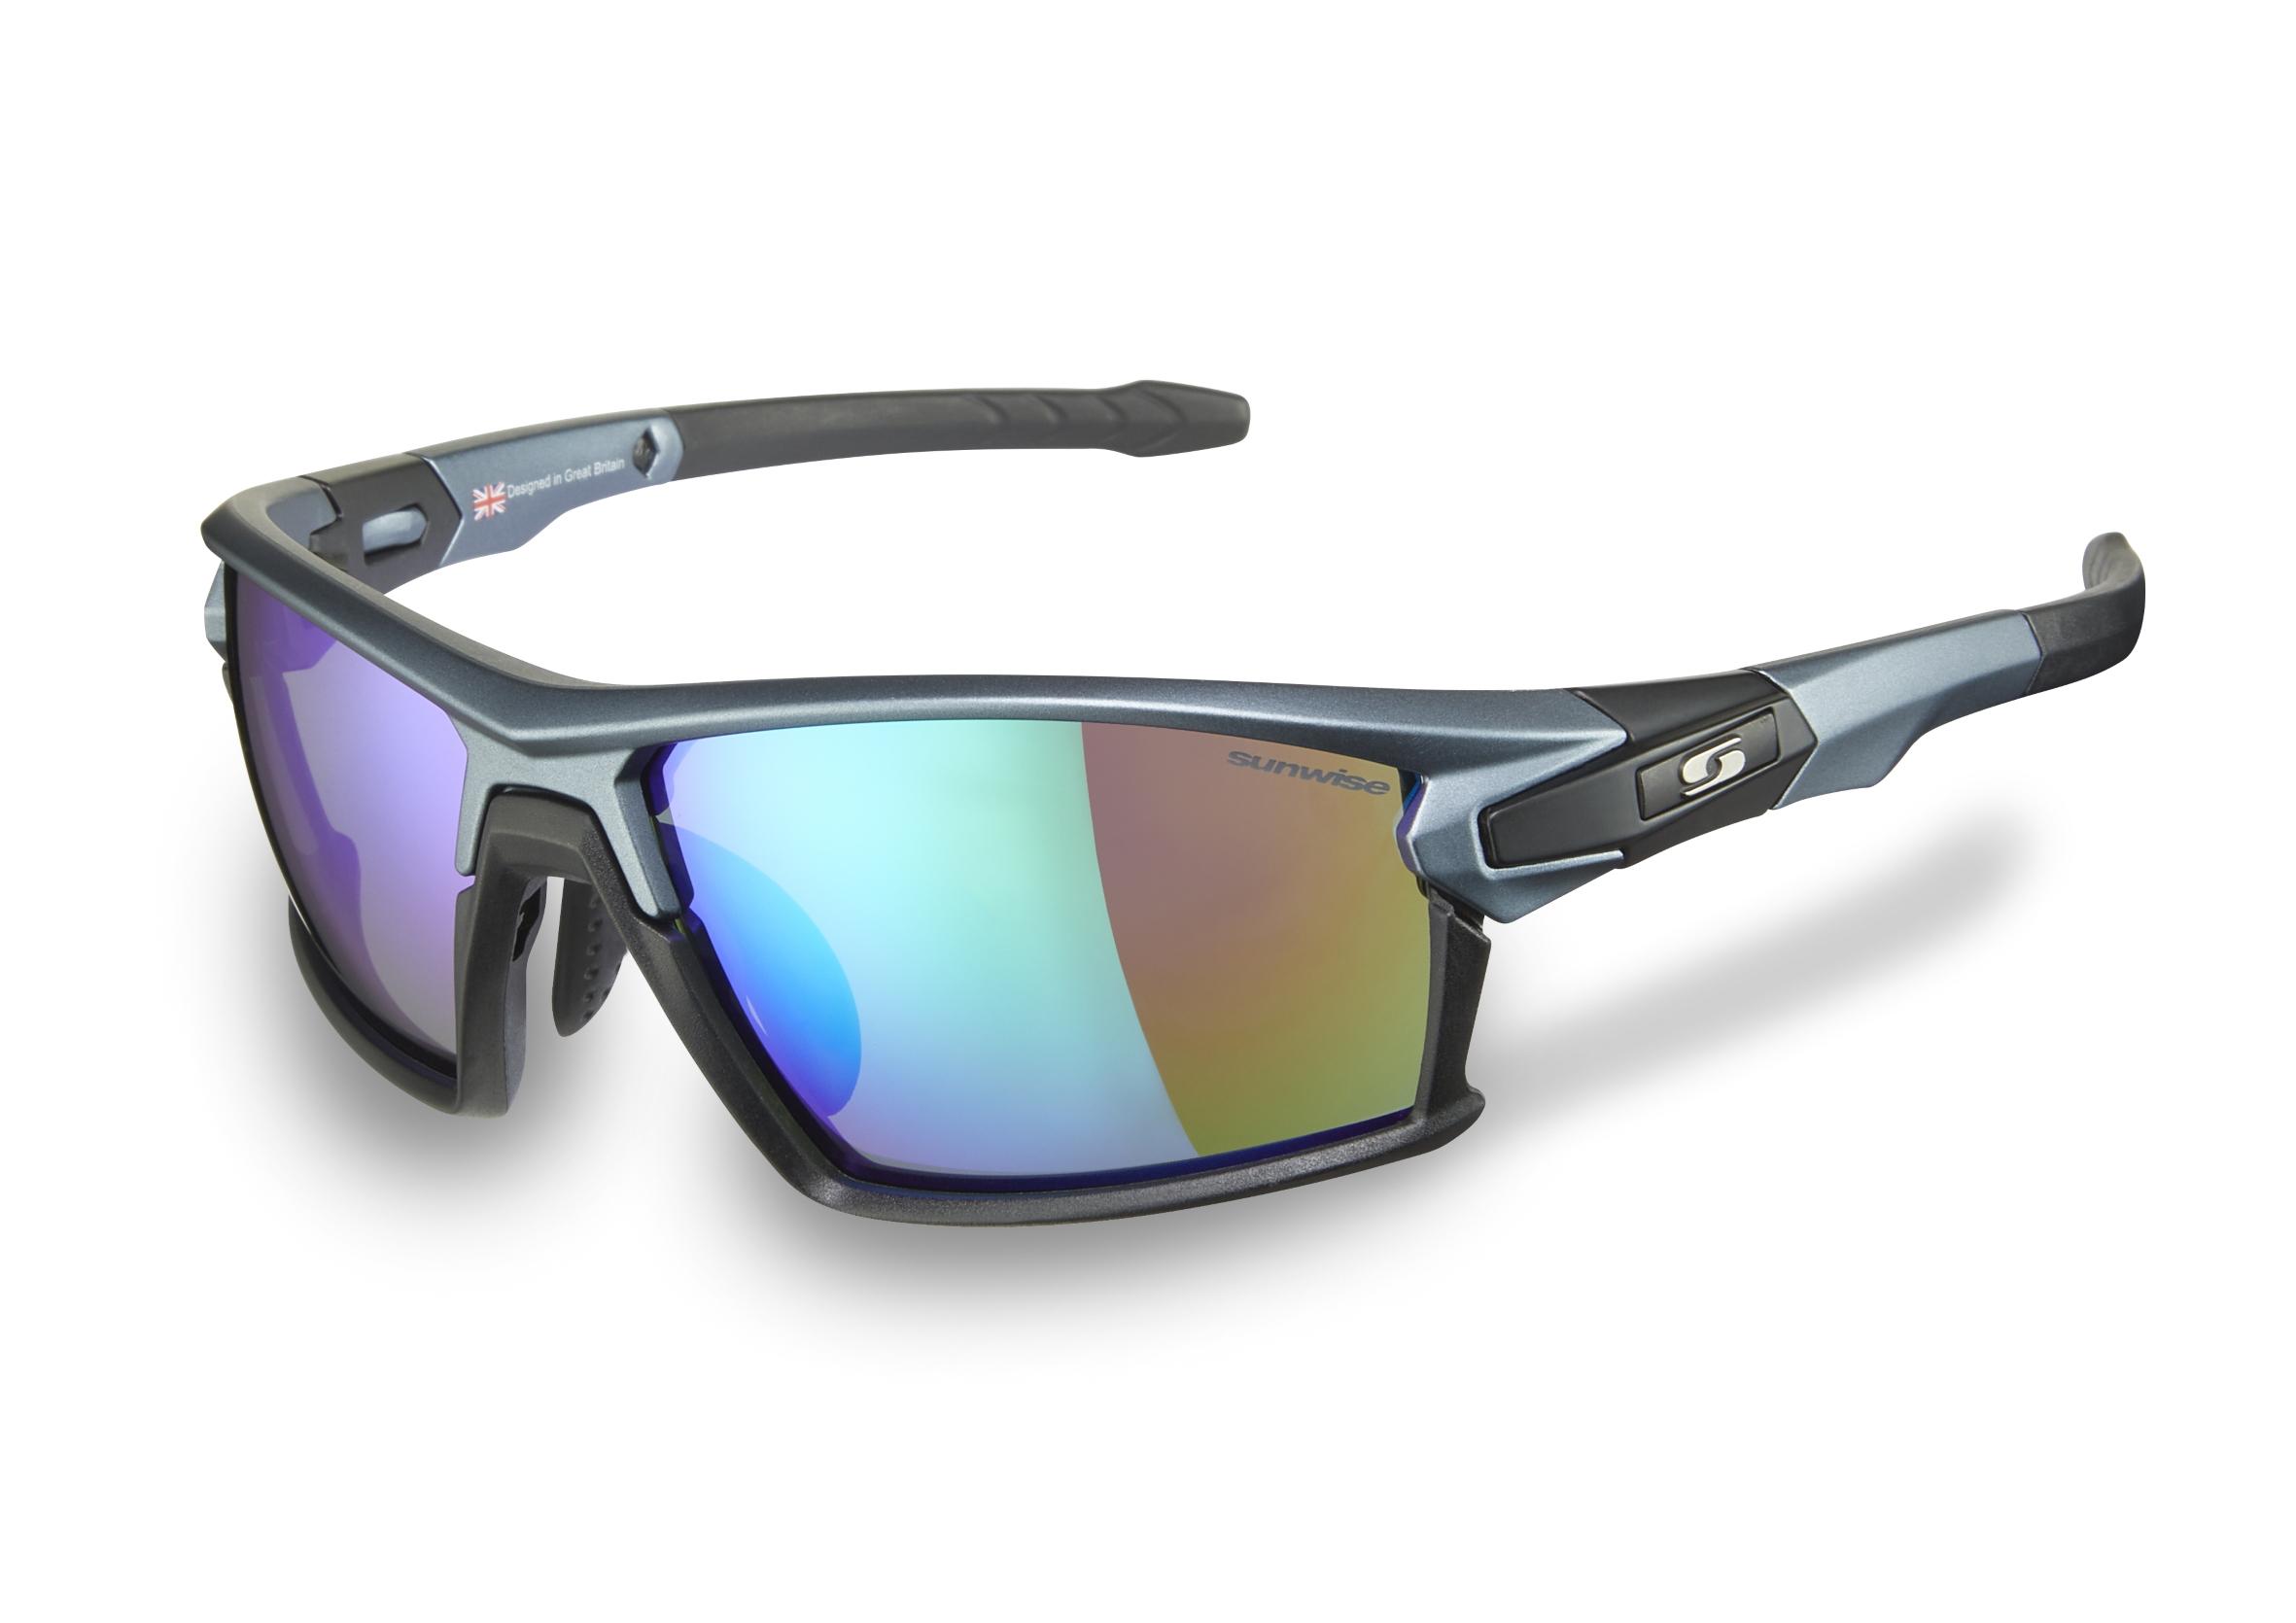 Eyewear Direct & Sunwise UK & Ireland Distribution Agreement